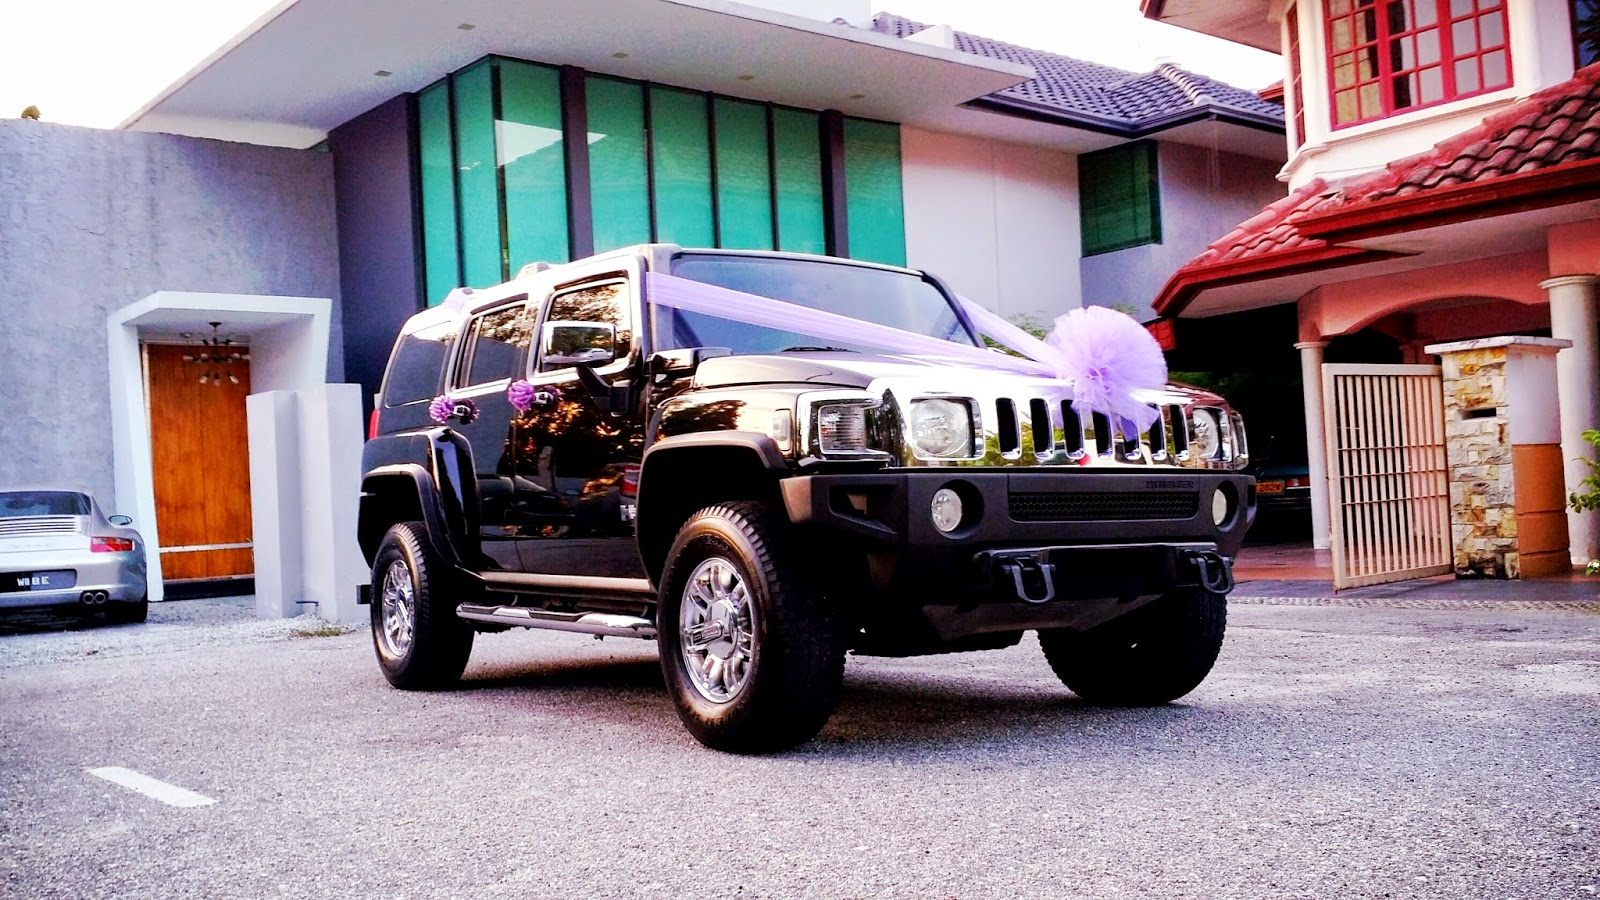 redorca malaysia wedding and event car rental hummer h3